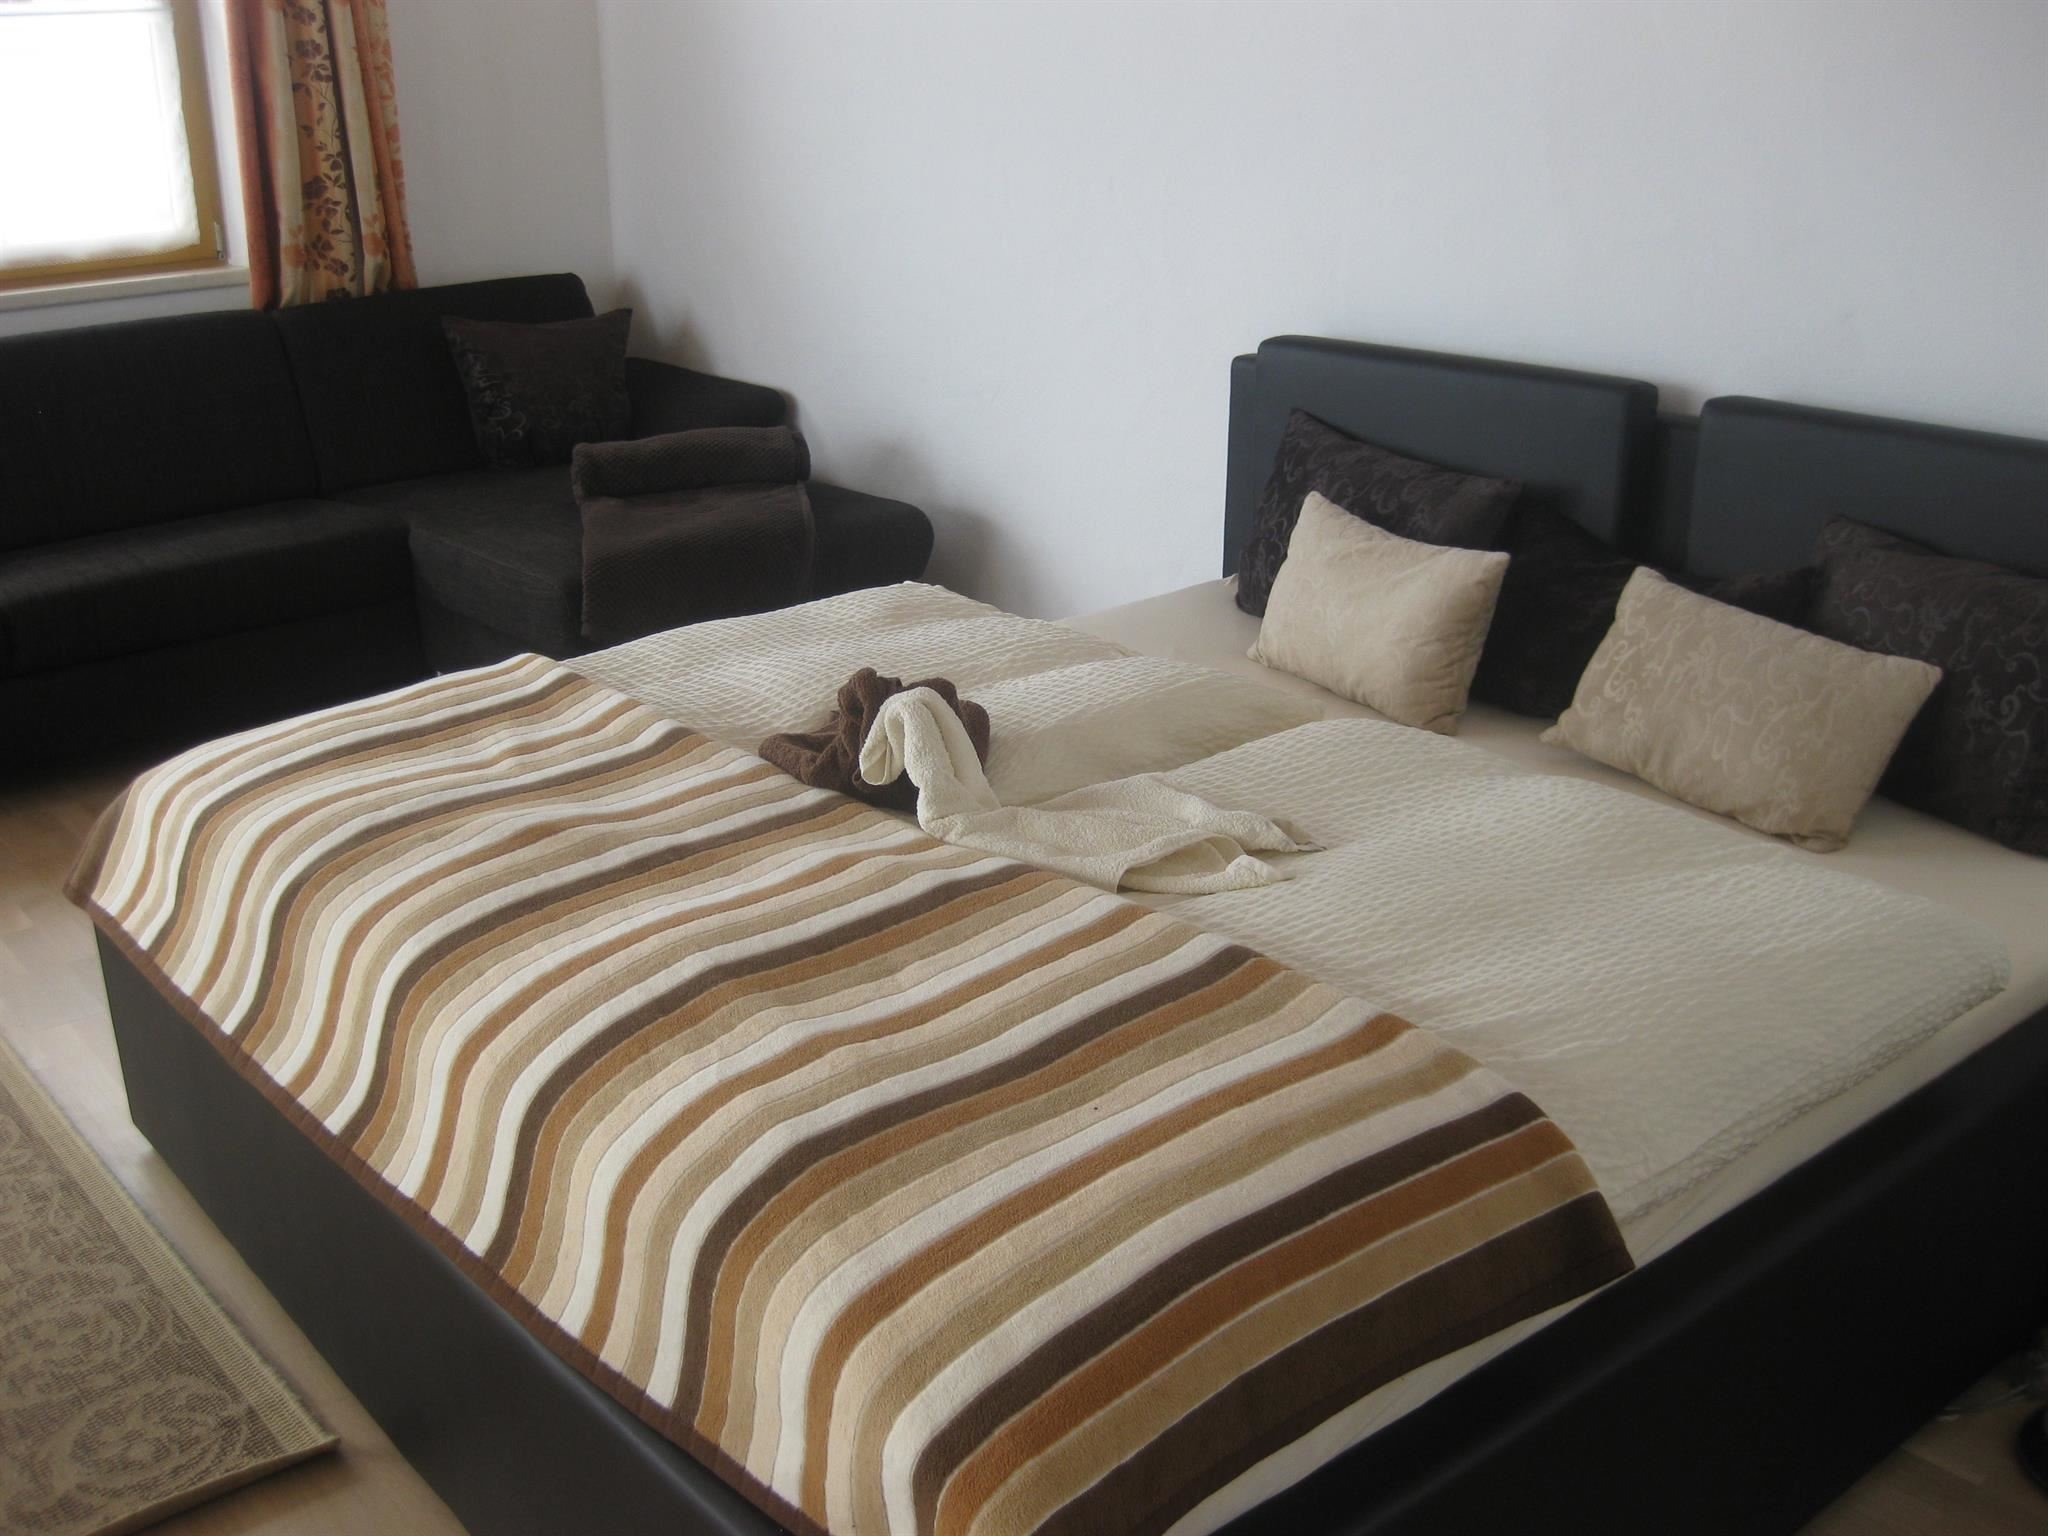 sofafarbe taube welche farbe dekokissen. Black Bedroom Furniture Sets. Home Design Ideas